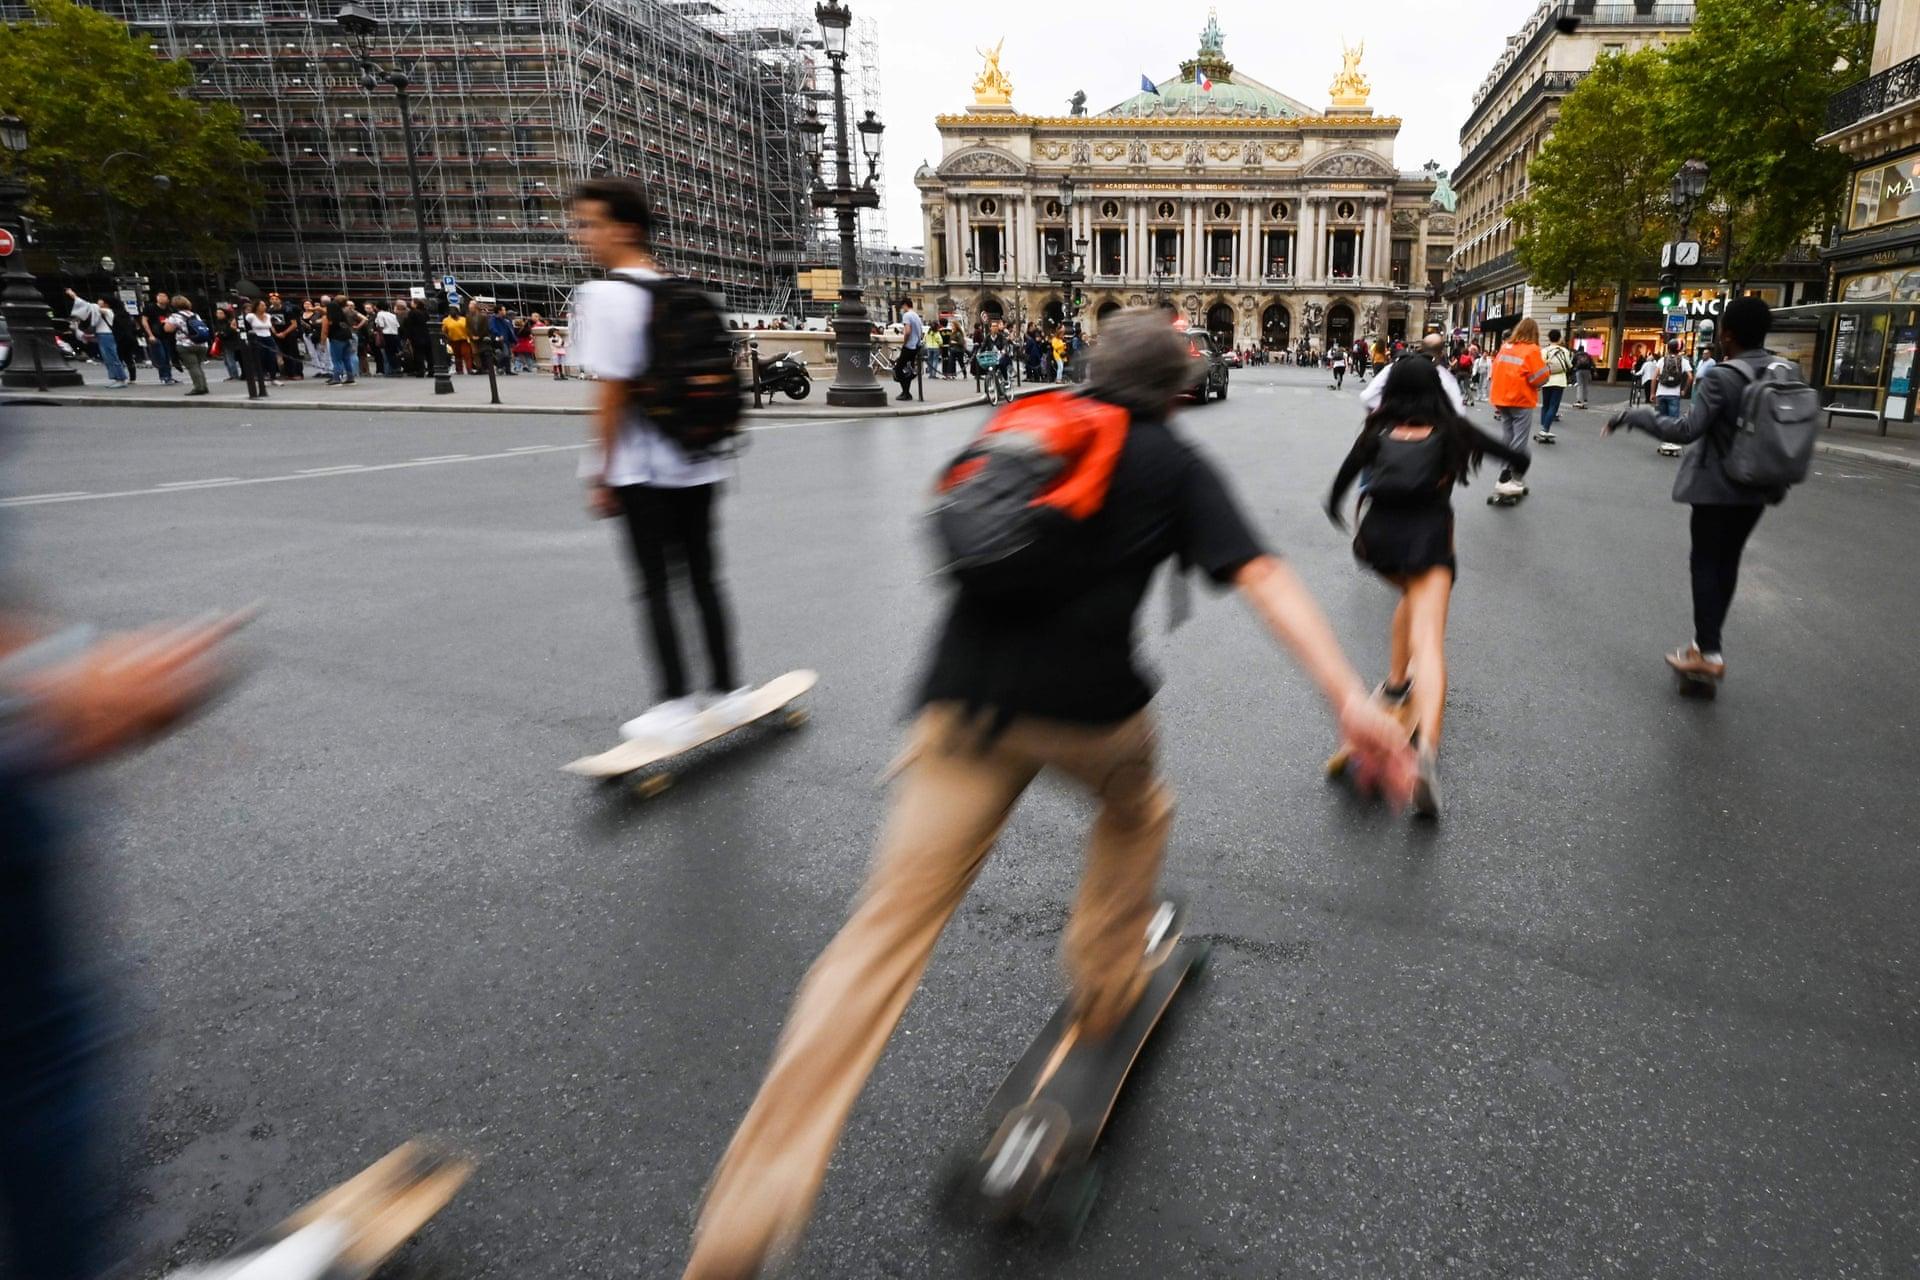 Paris' Opera Avenue on car free day 2019 (photo credit  theguardian.com.uk )